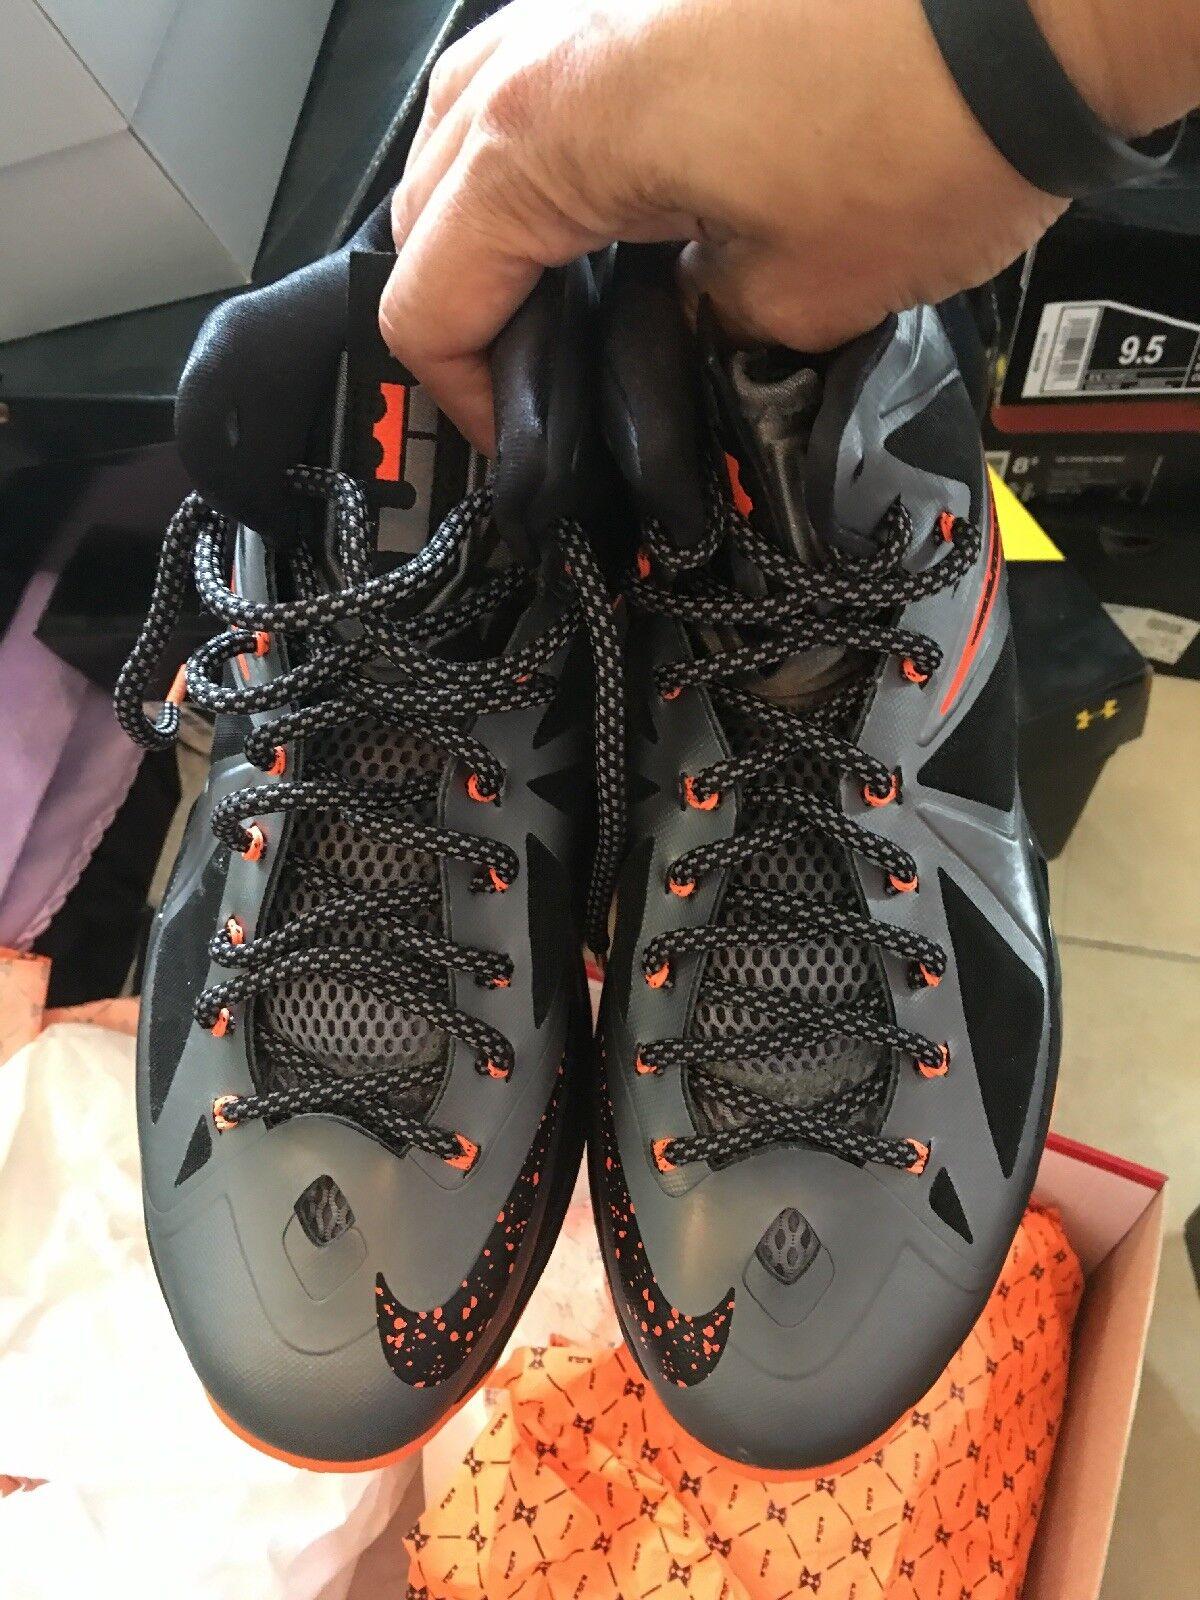 nike lebron x basketball orange-black holzkohle / gesamt männer orange-black basketball größe 9. 450892